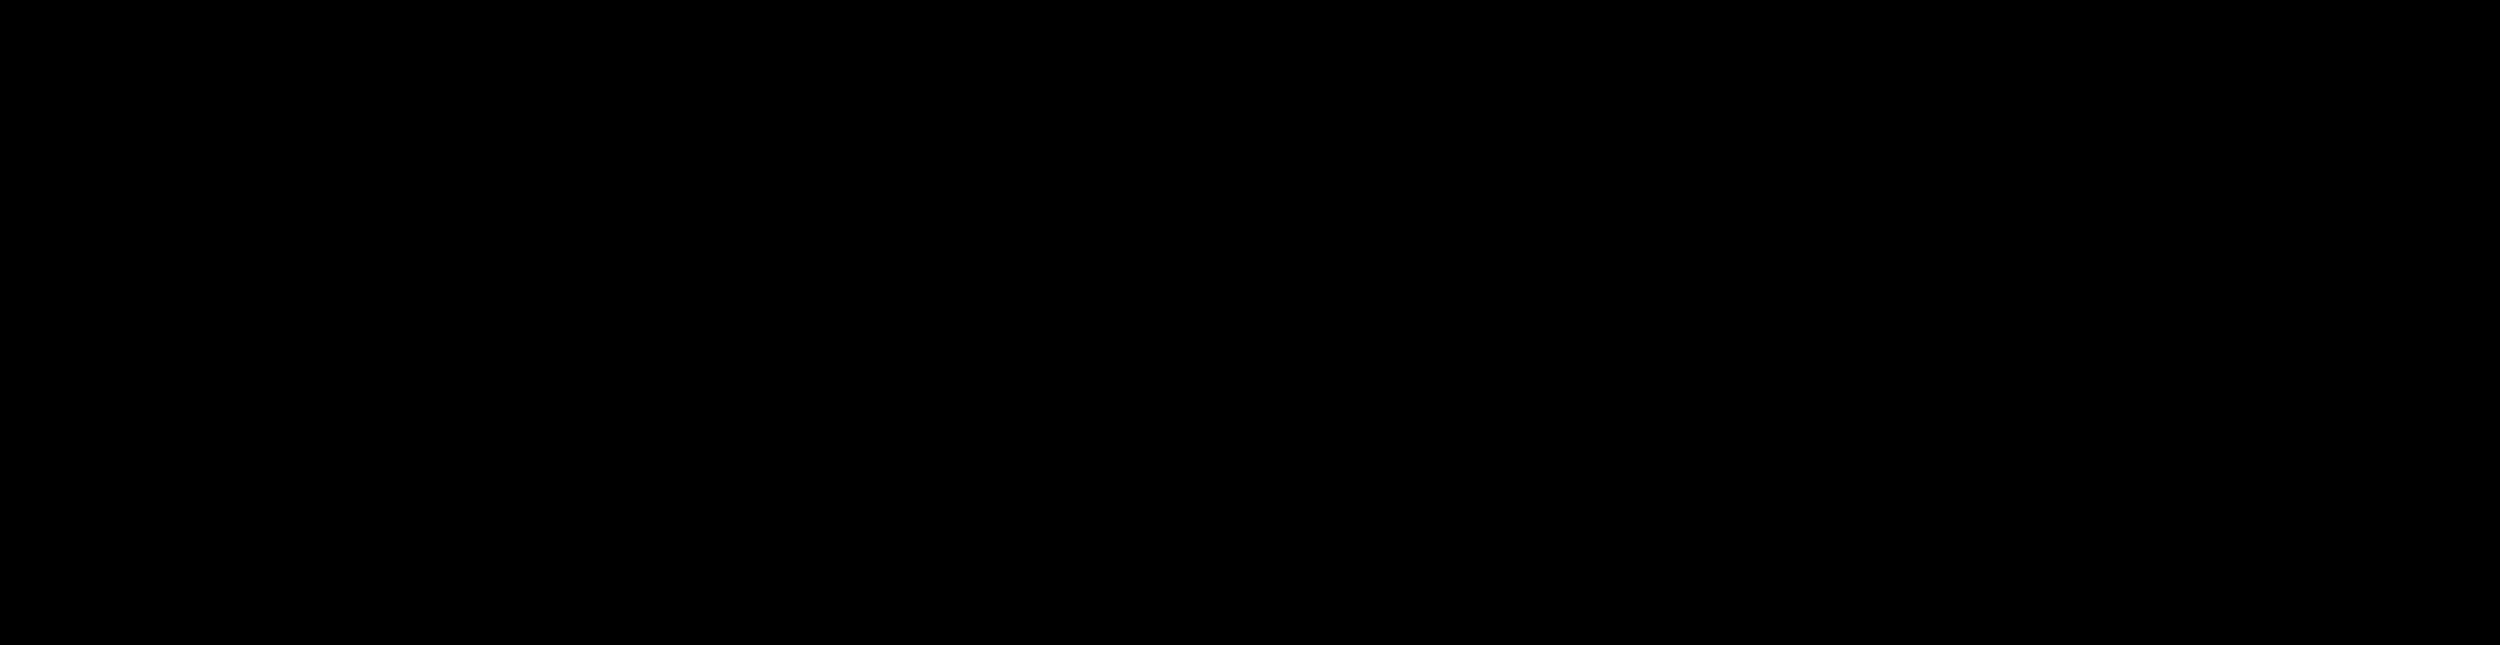 Bershka_logo.png